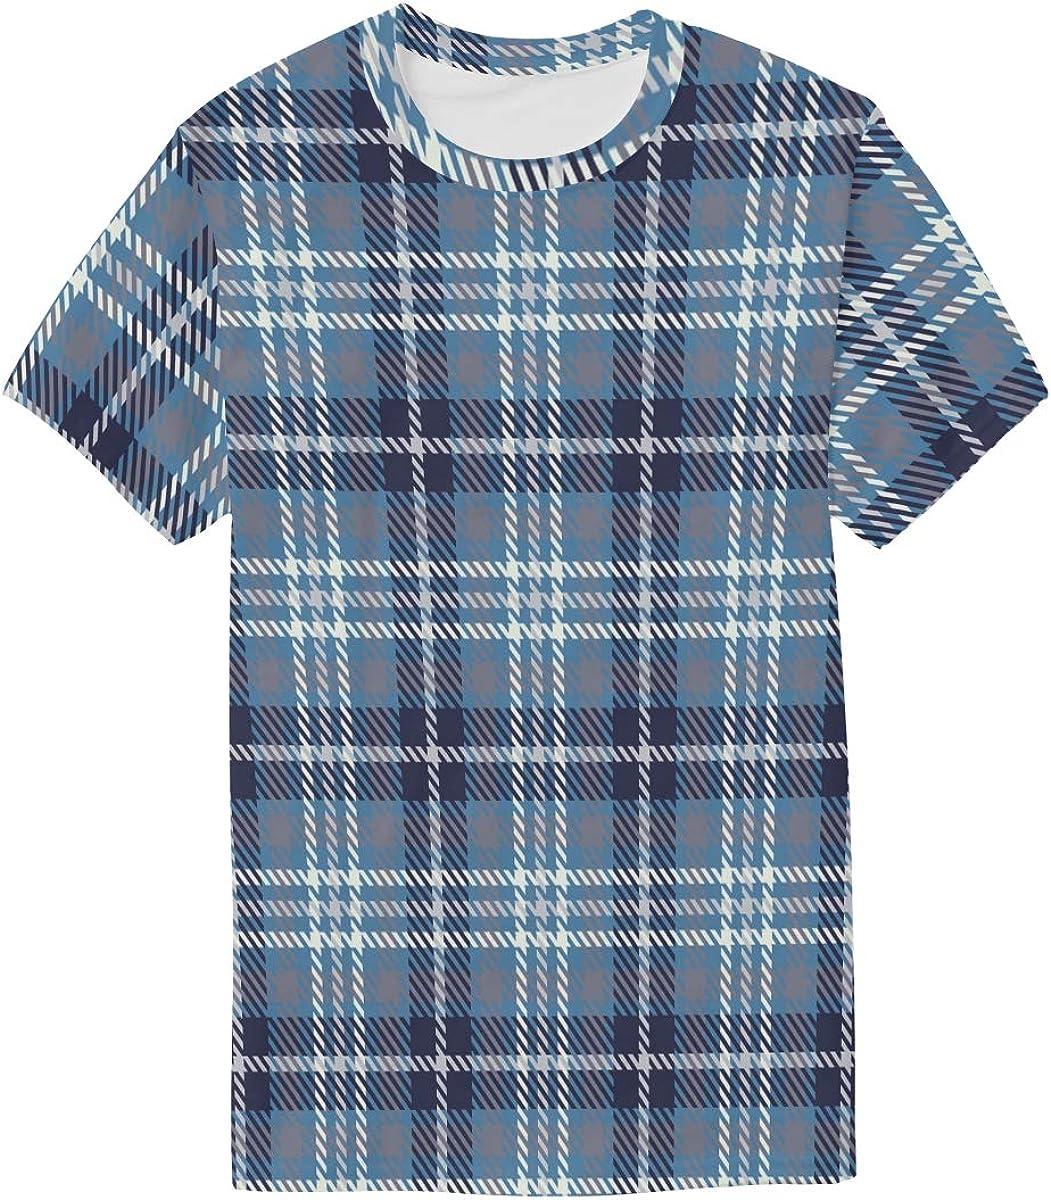 Aluys boutique Mens Casual Tops Short-Sleeve Crewneck Print T-Shirt